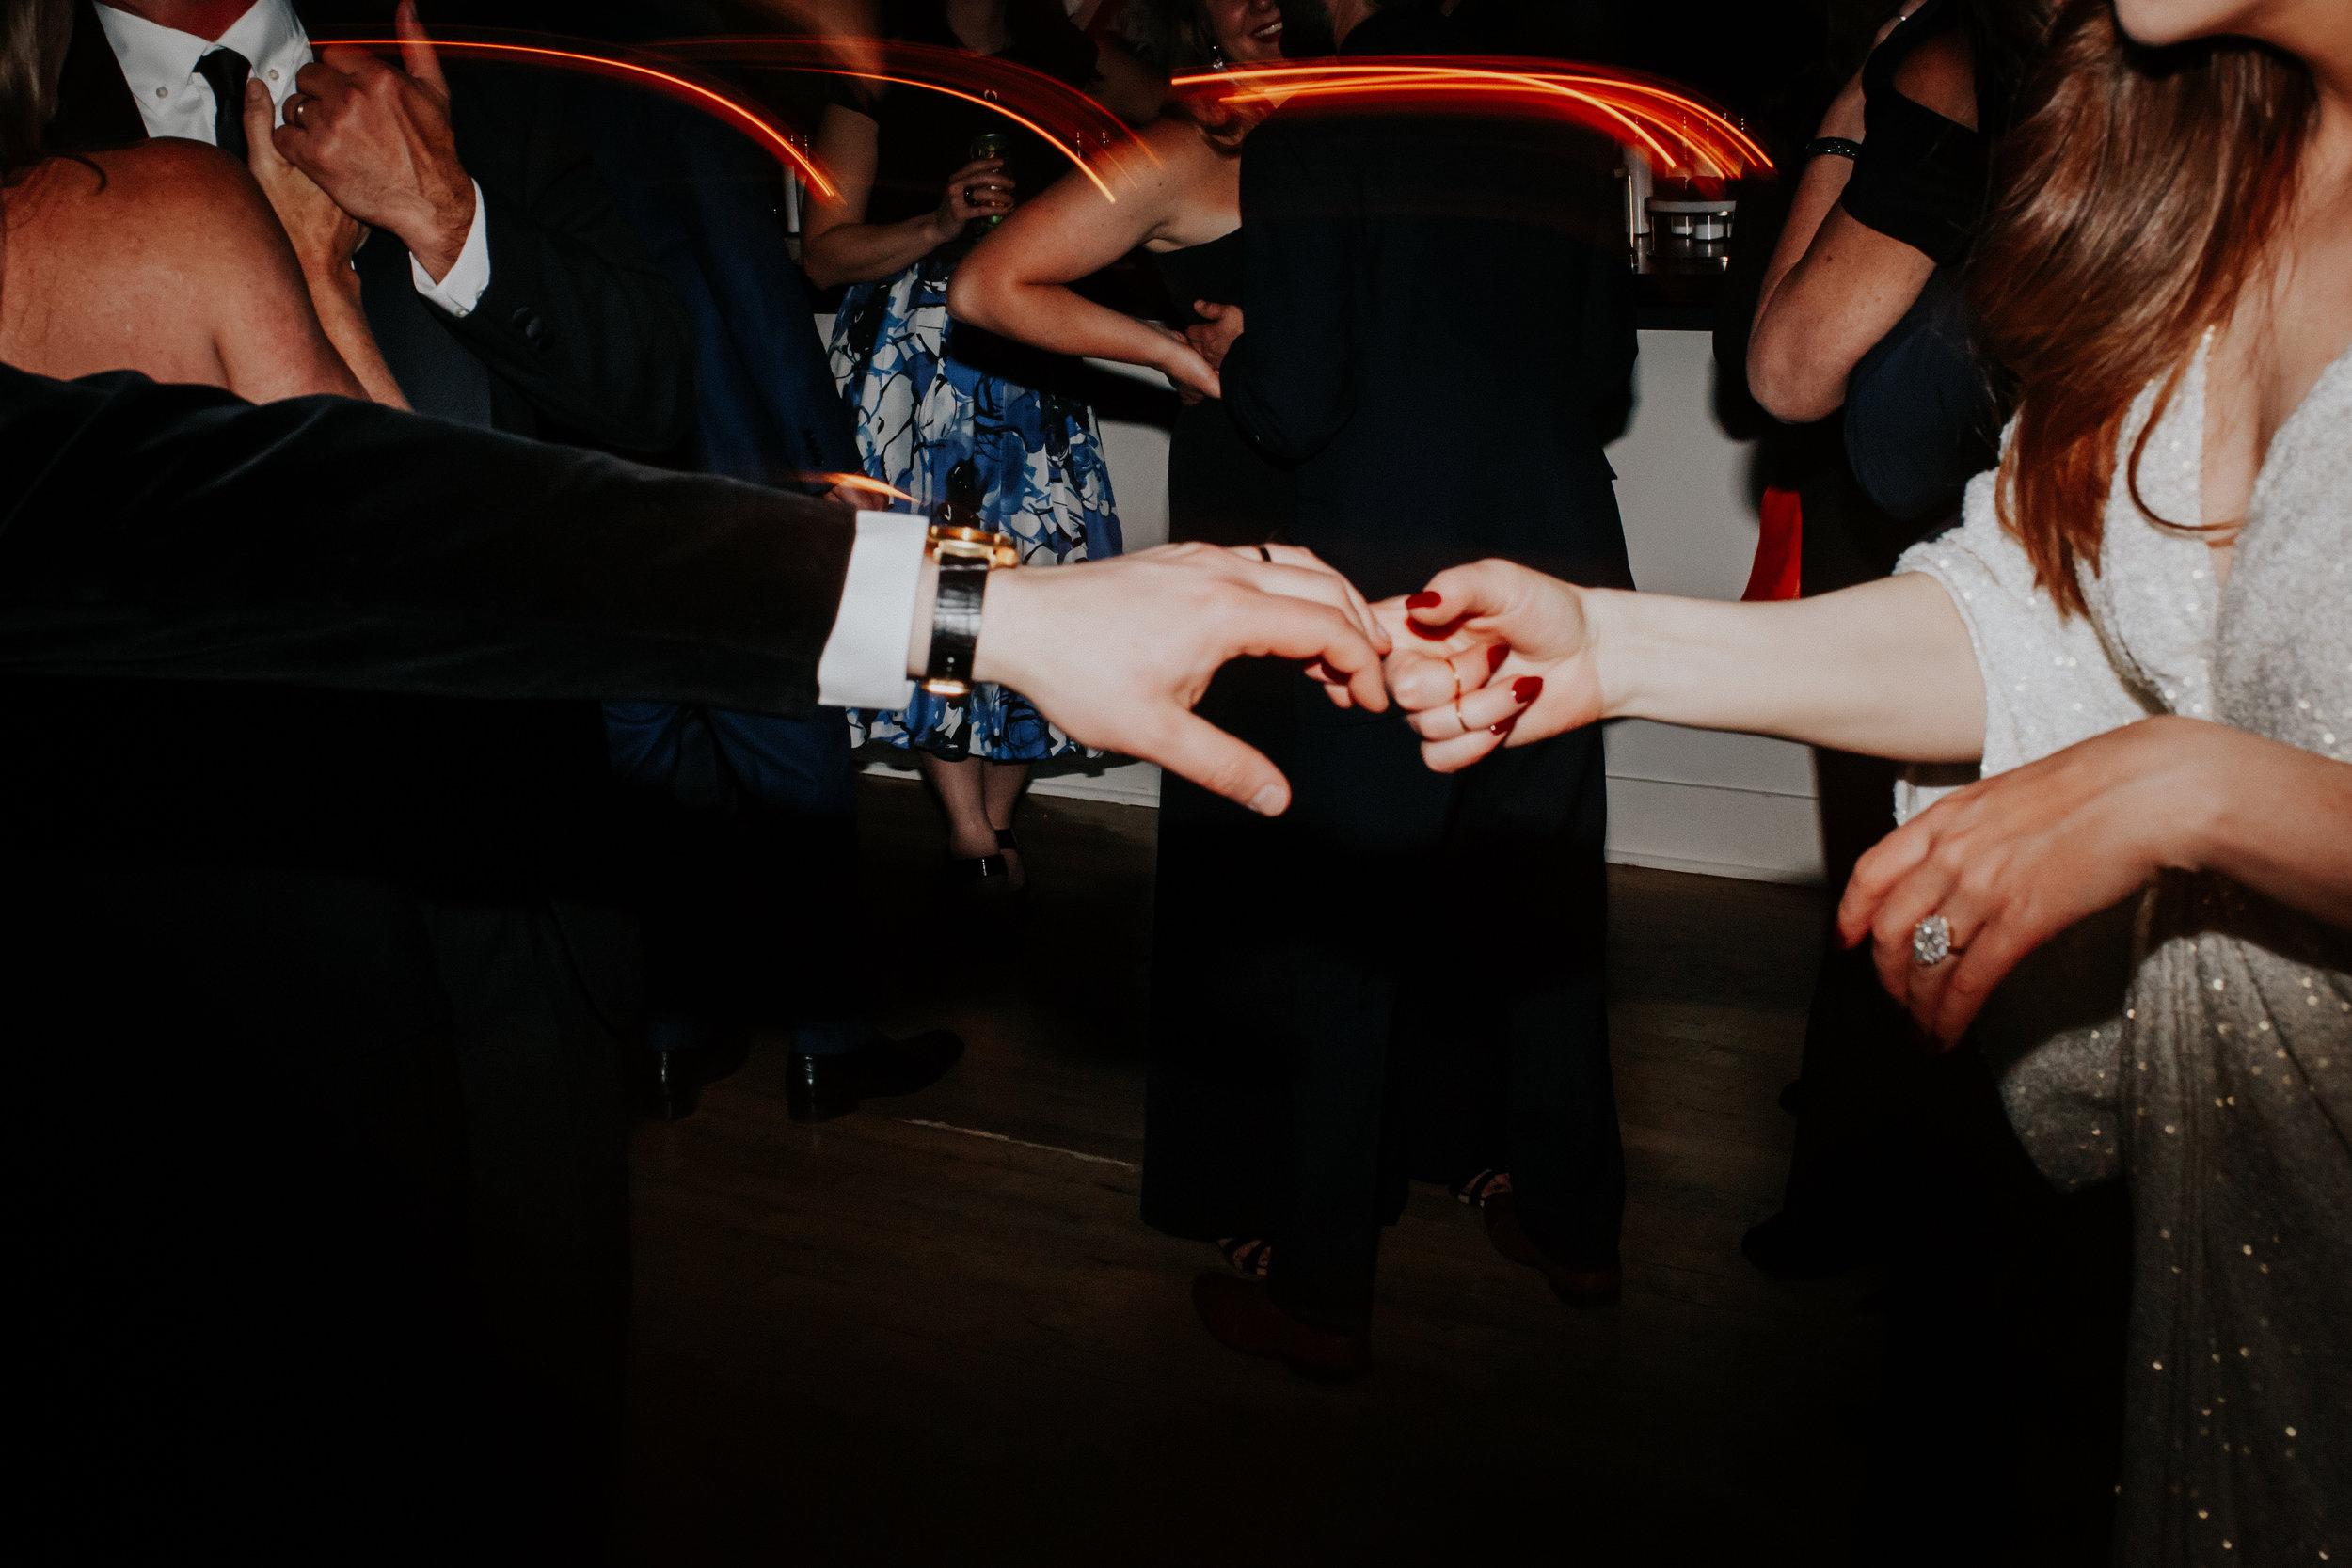 midwest illinois wedding photographer candid